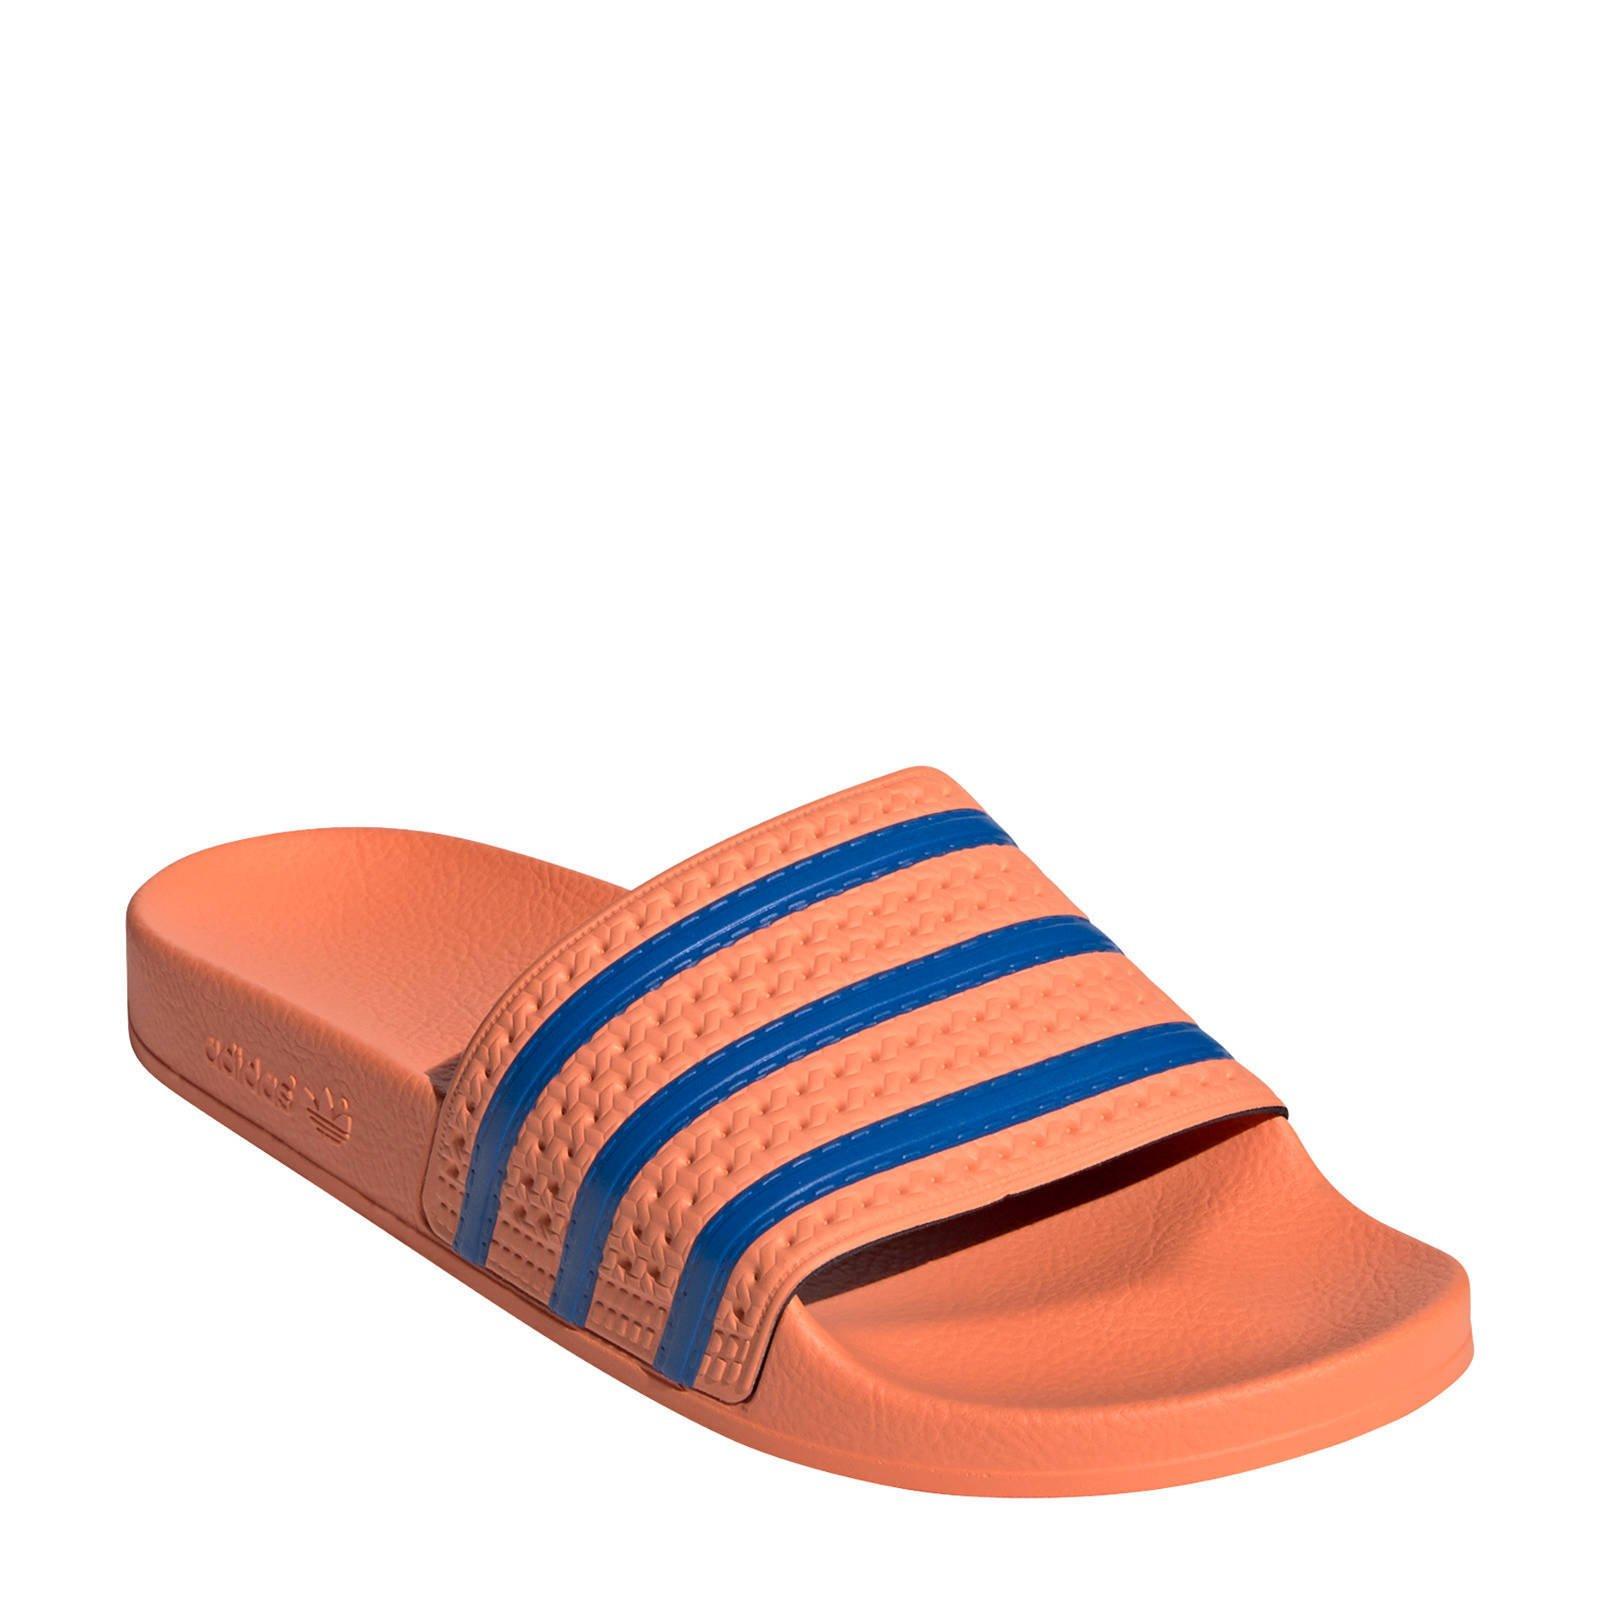 adidas Originals Adilette badslippers oranje/blauw | wehkamp